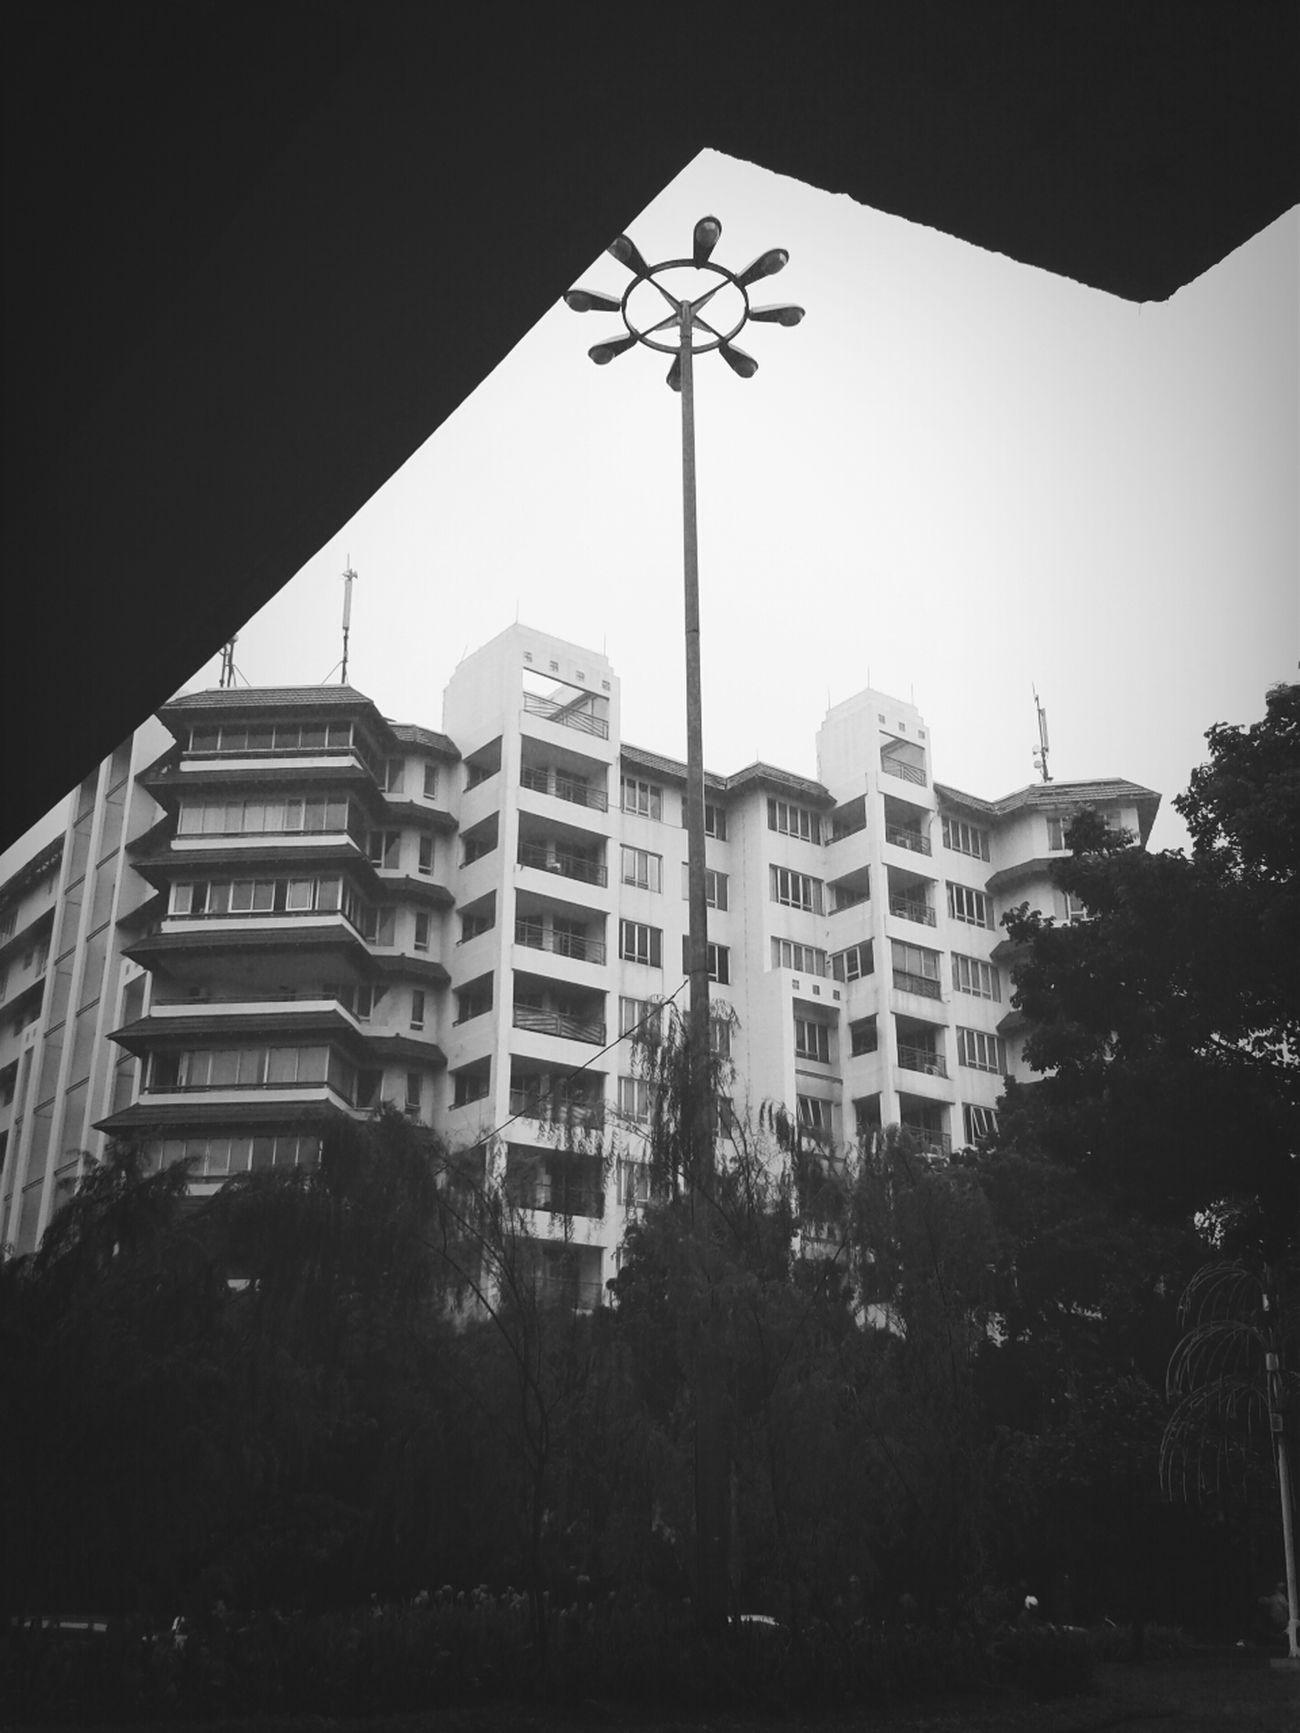 Blackandwhite Architecture Apartment